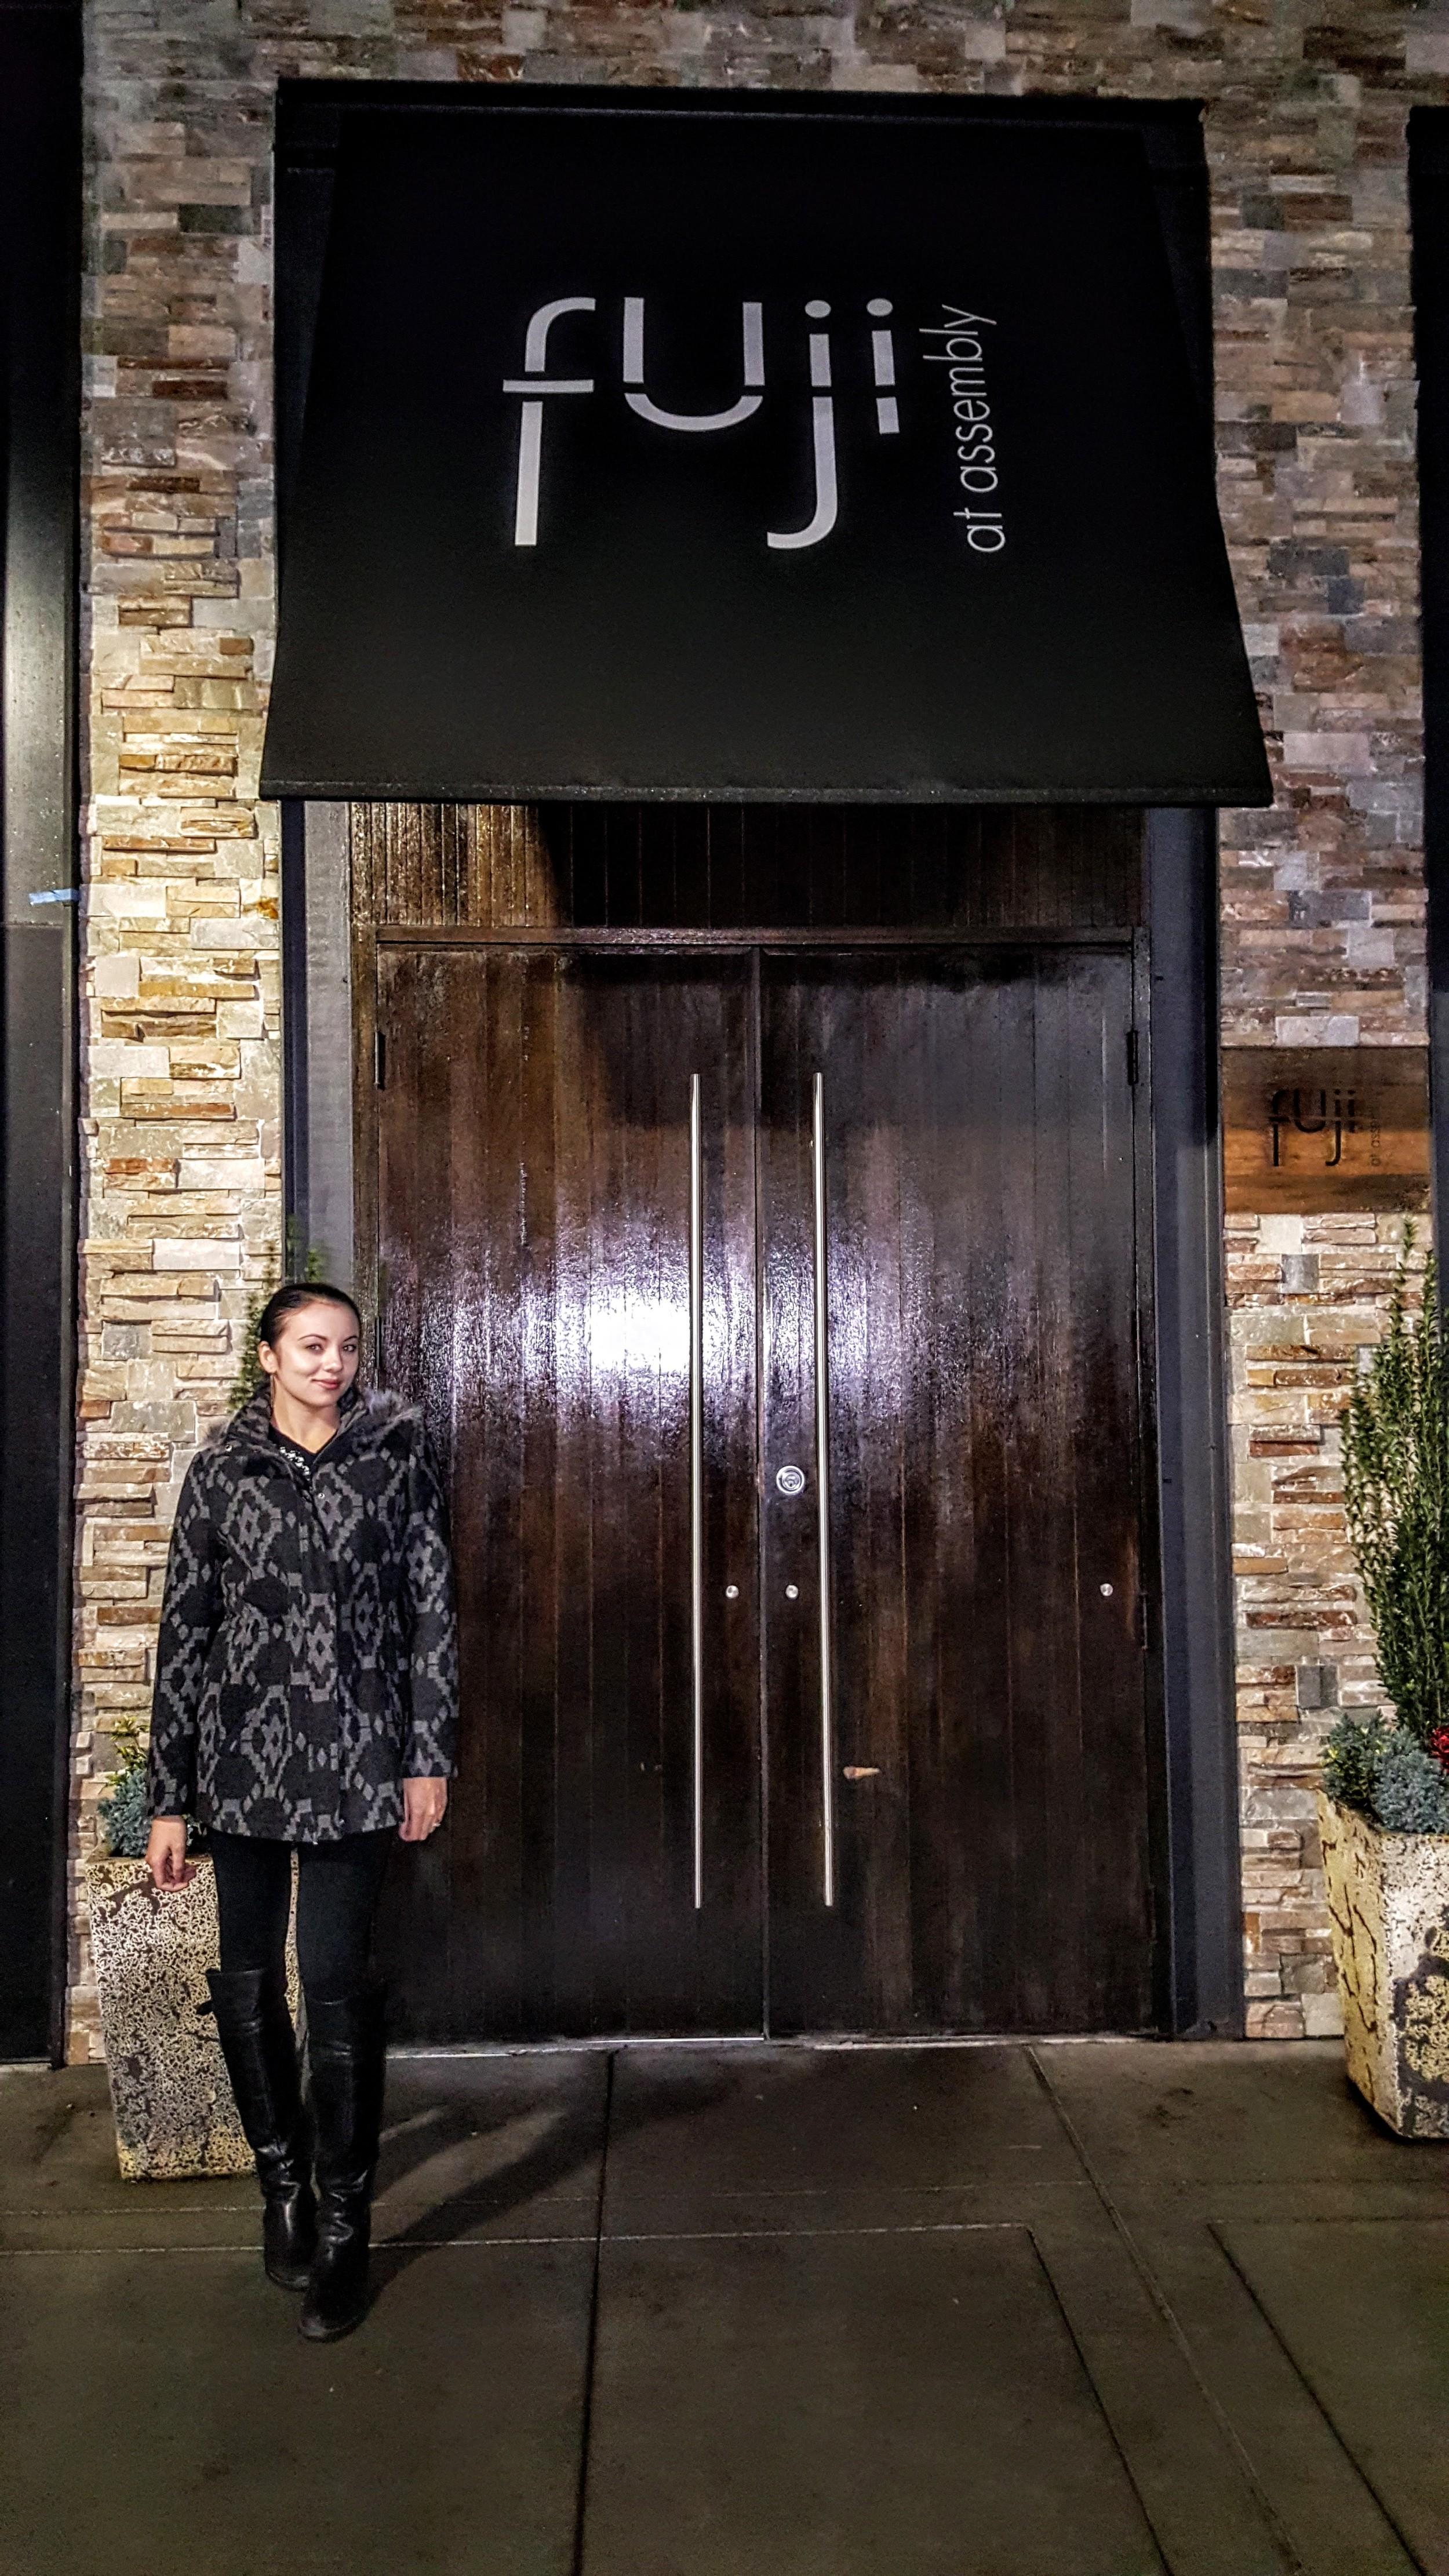 fuji restaurant life of ardor